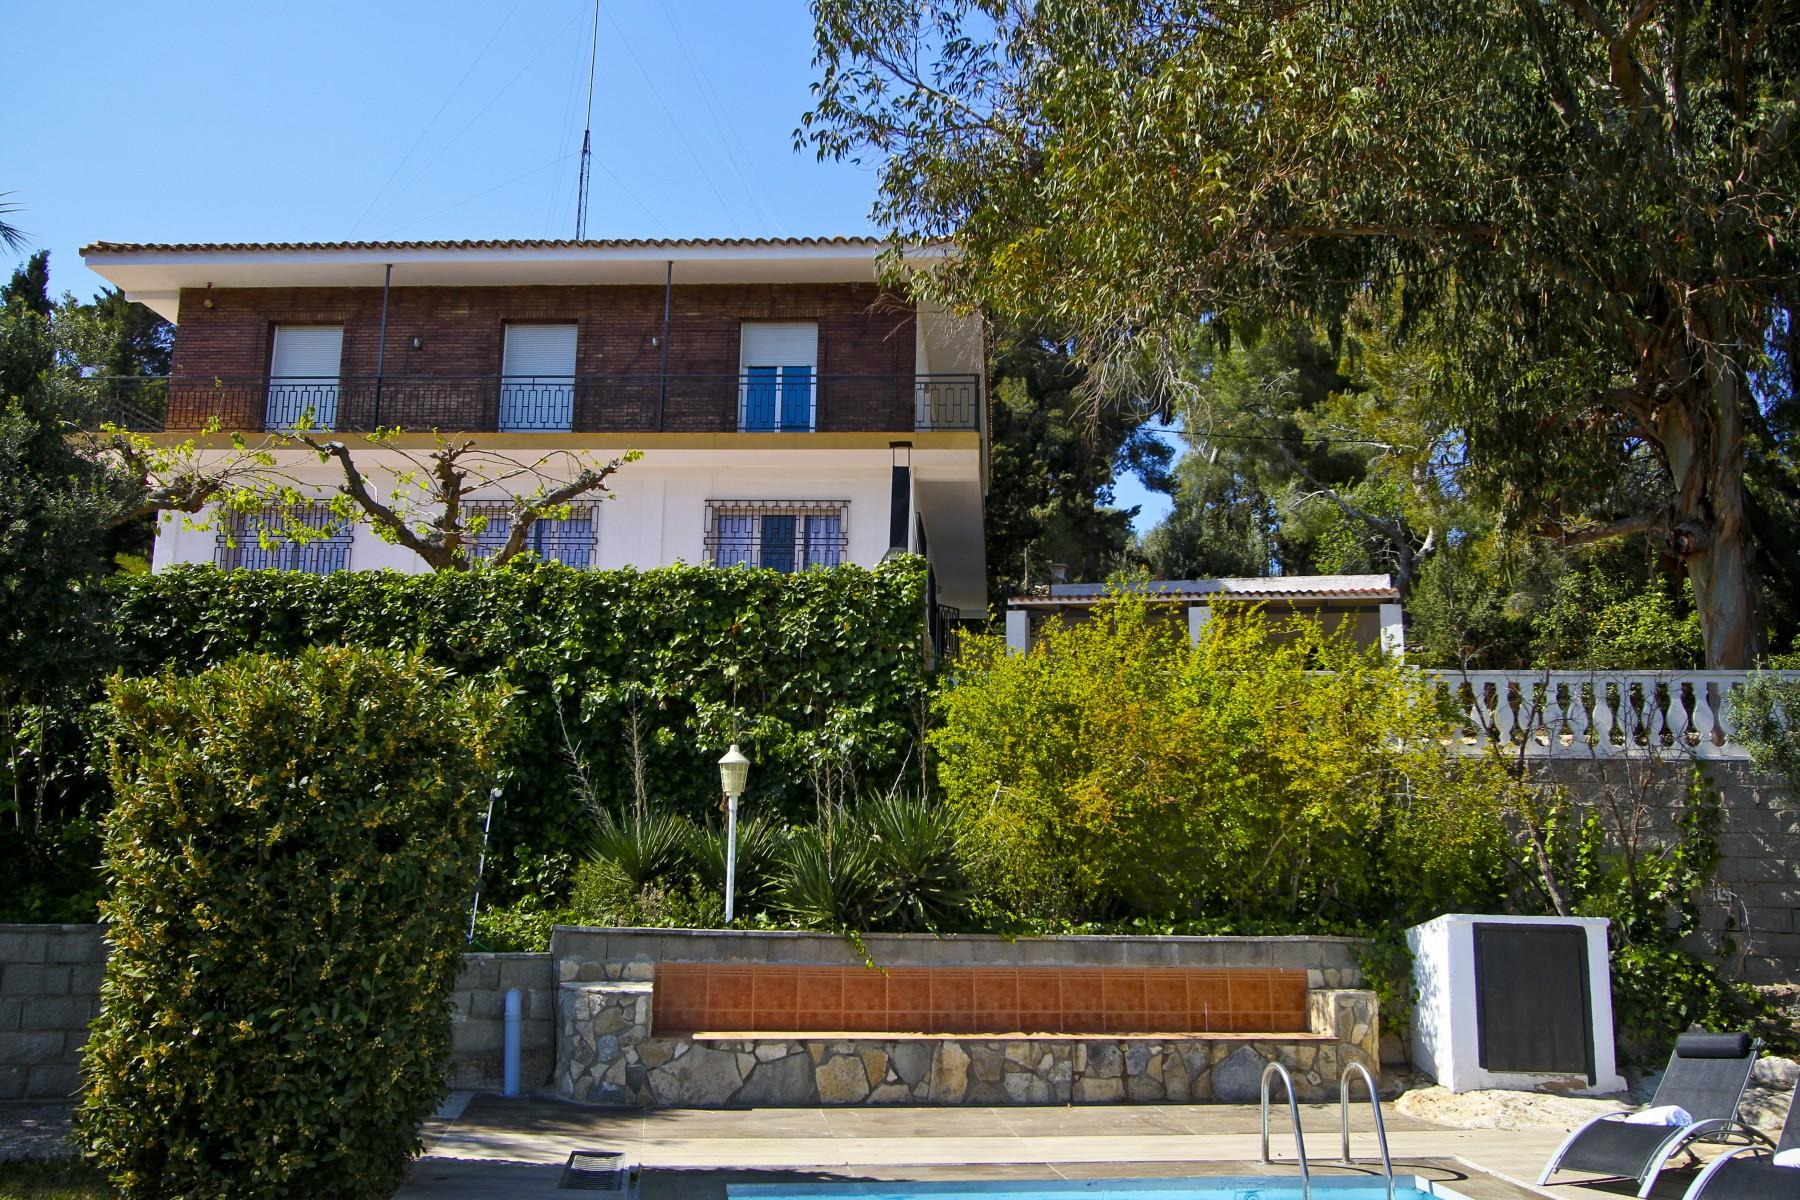 Alquiler villa exclusiva con piscina privada en tarragona for Alquiler chalet con piscina privada tarragona